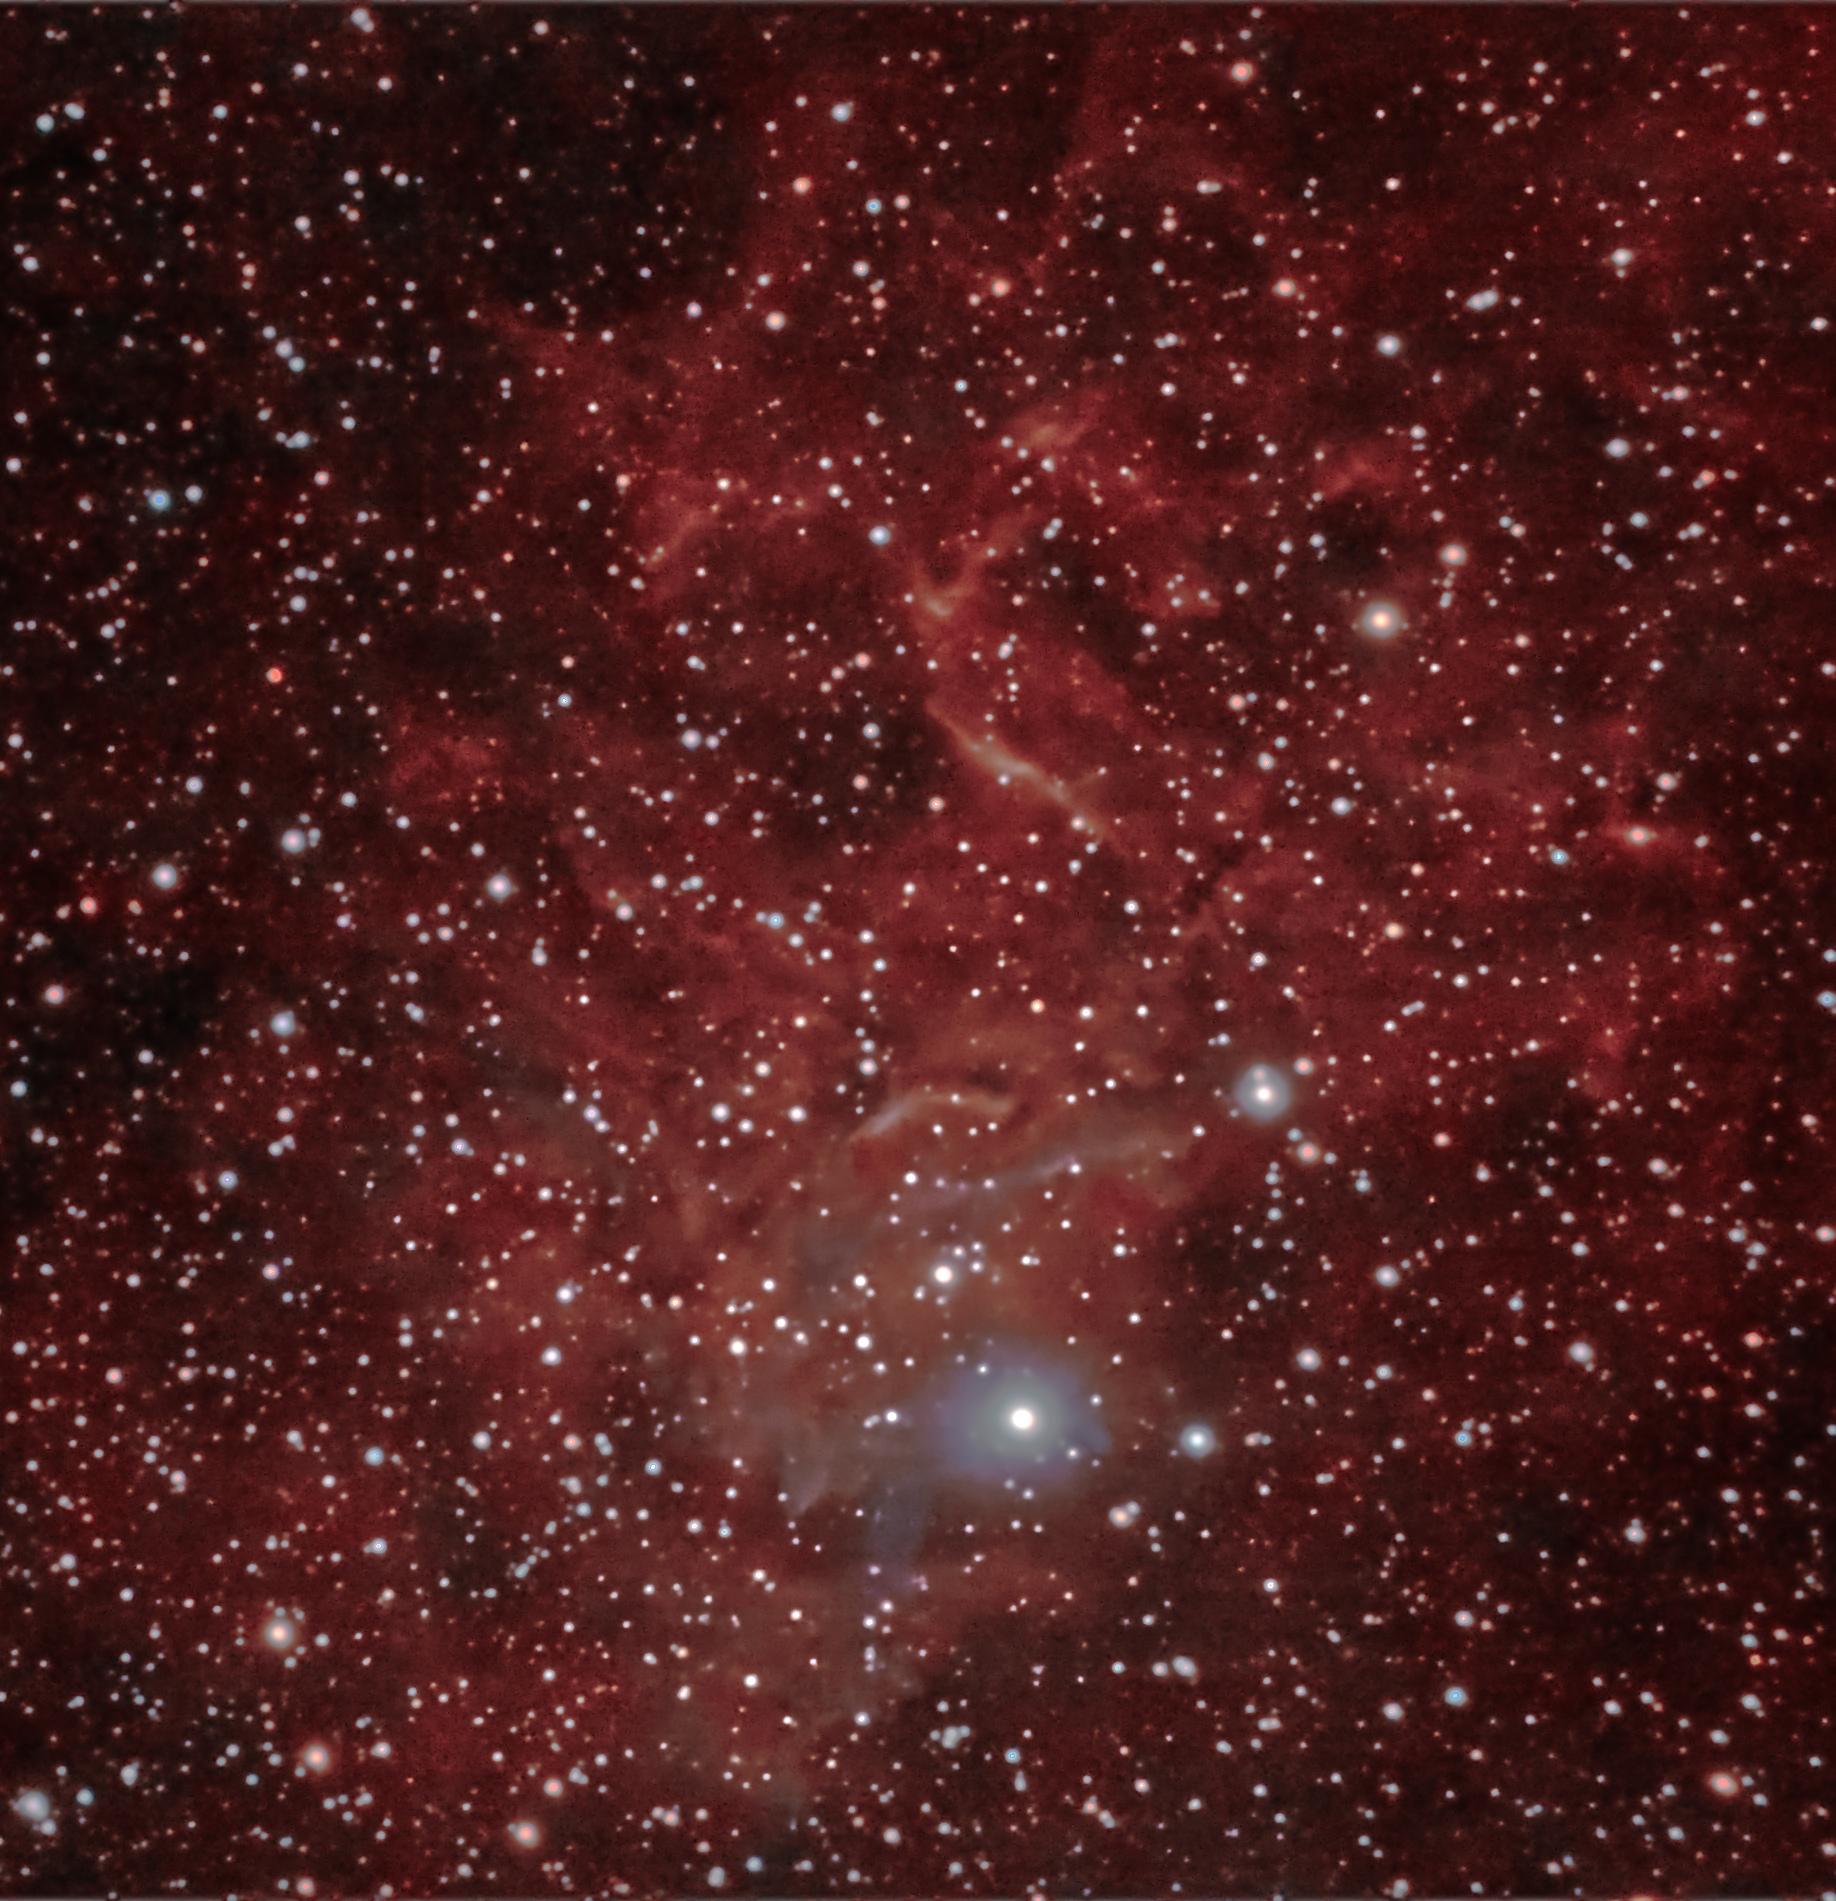 IC405-Flamboyante_4nights_DSS_Siril_AP.jpg